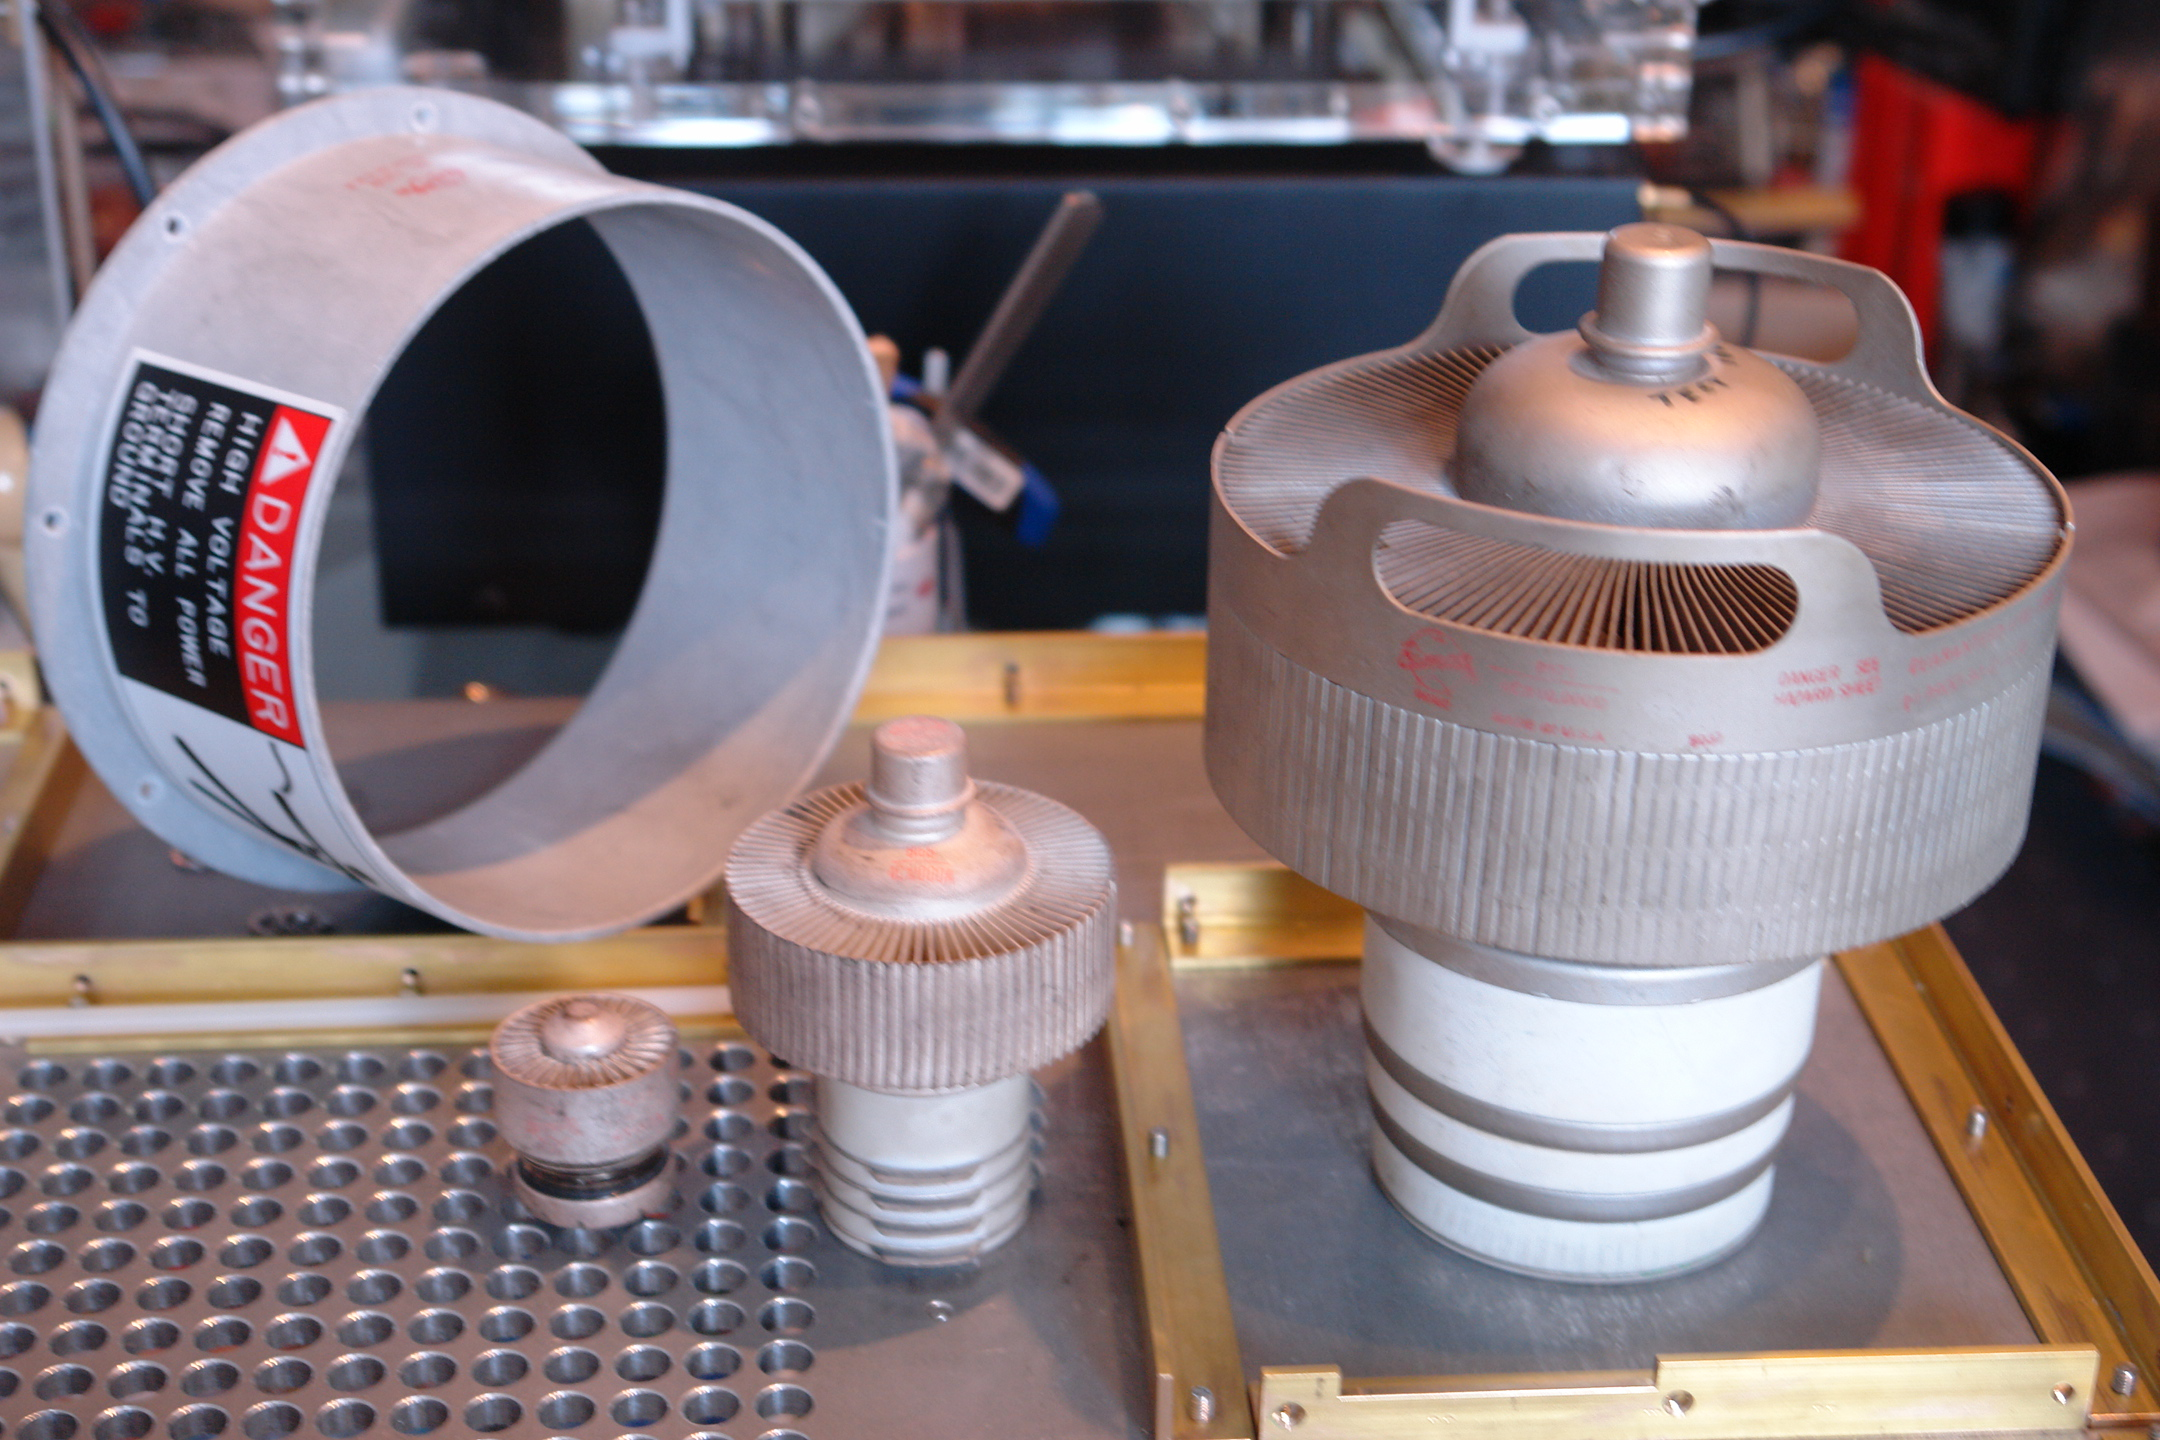 Dc9dz Project Tsunami Power Amplifier Pa Using 4cx10000d 1500 Watt High Click To Enlarge Image